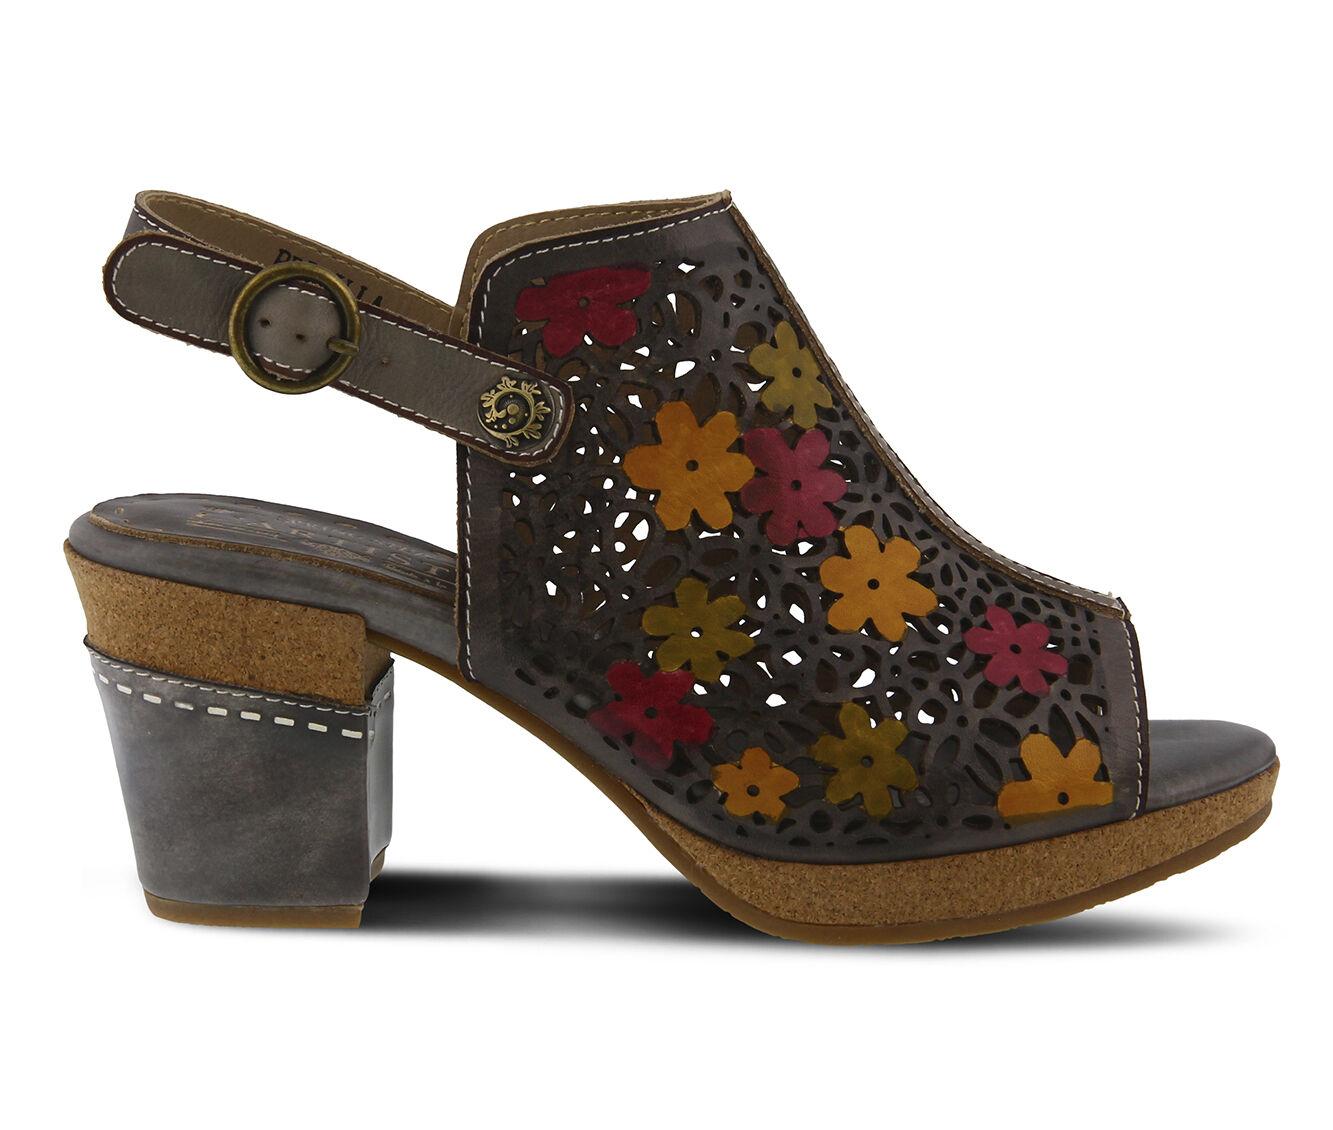 uk shoes_kd6460